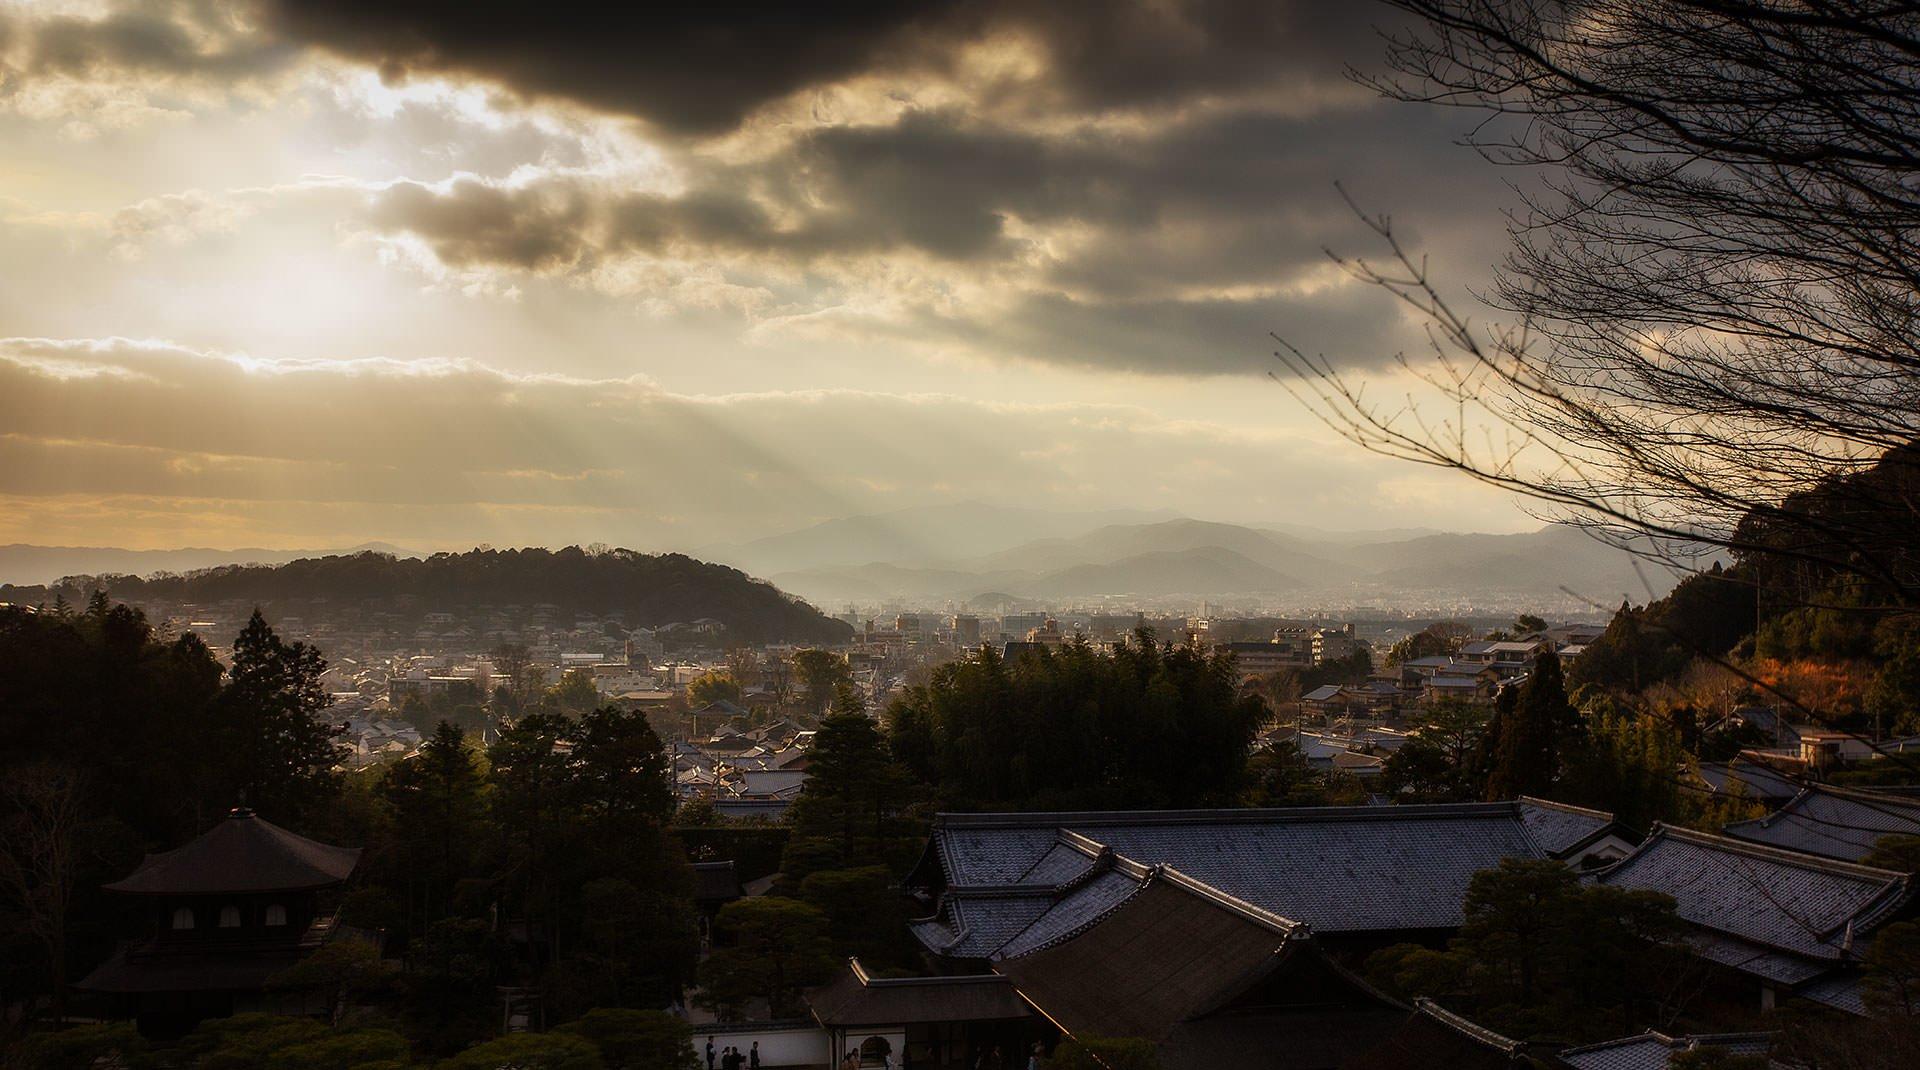 landscape photography 14